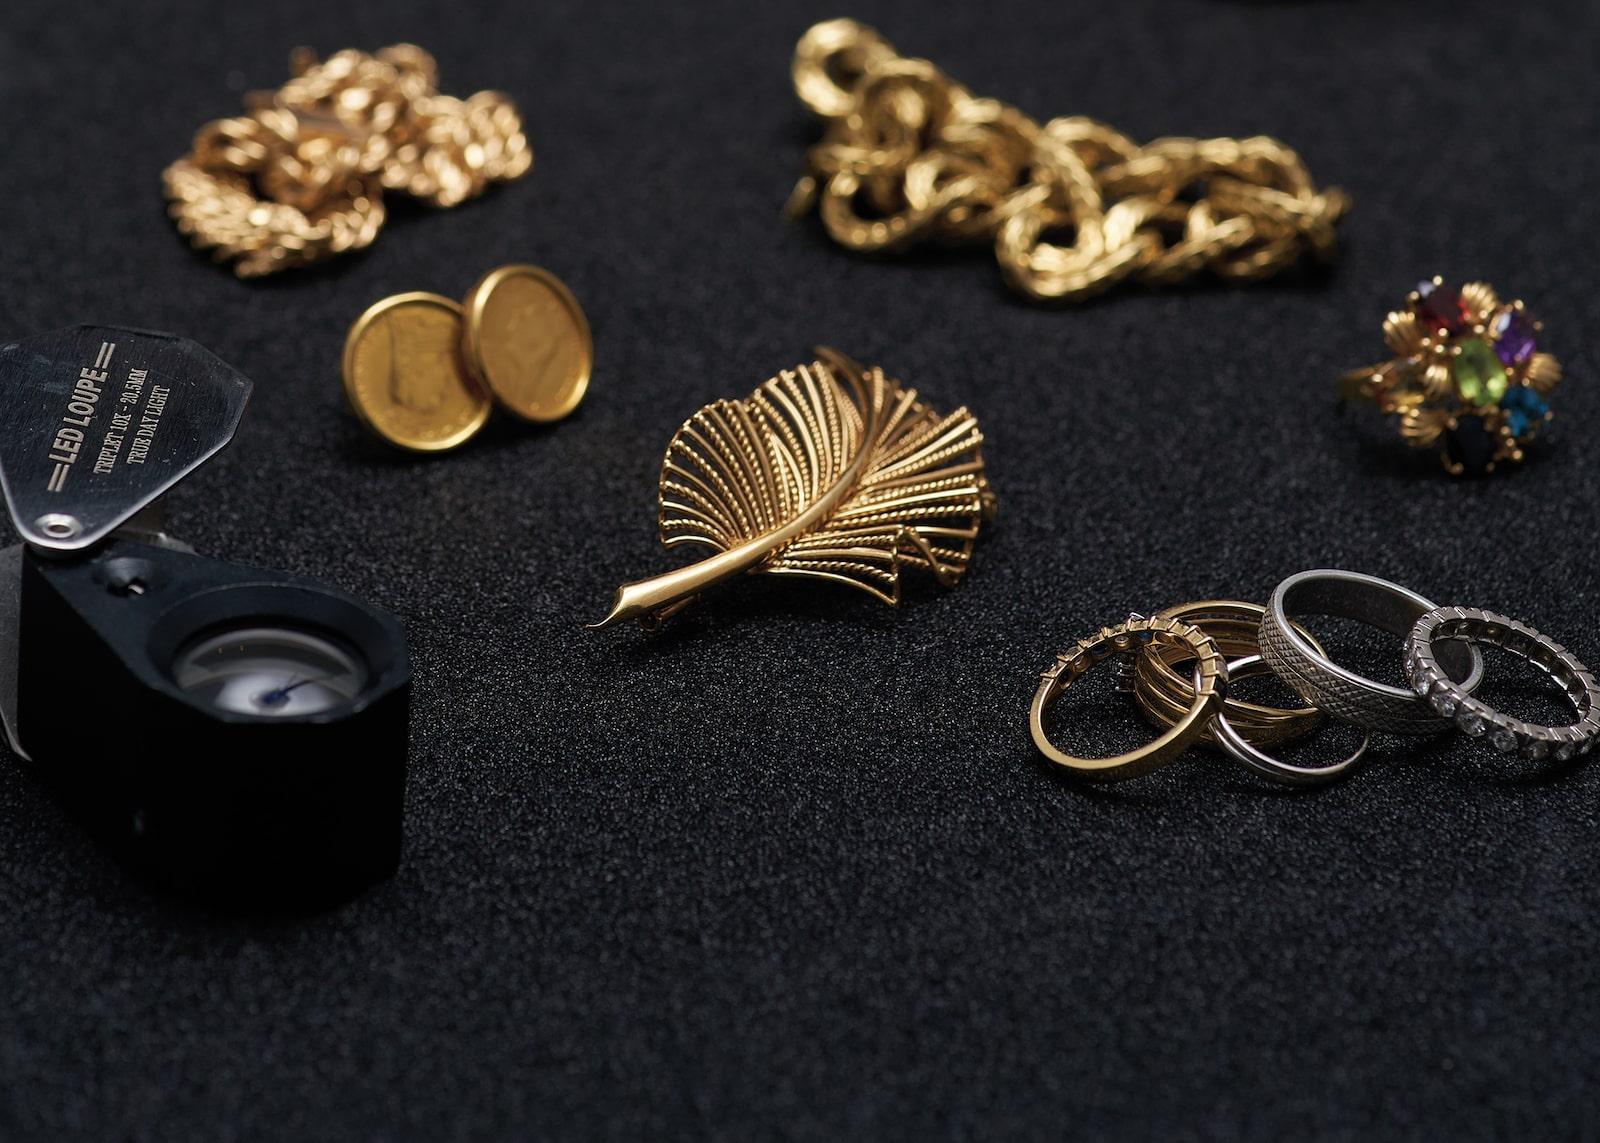 numissima revente et achat d'or et d'argent